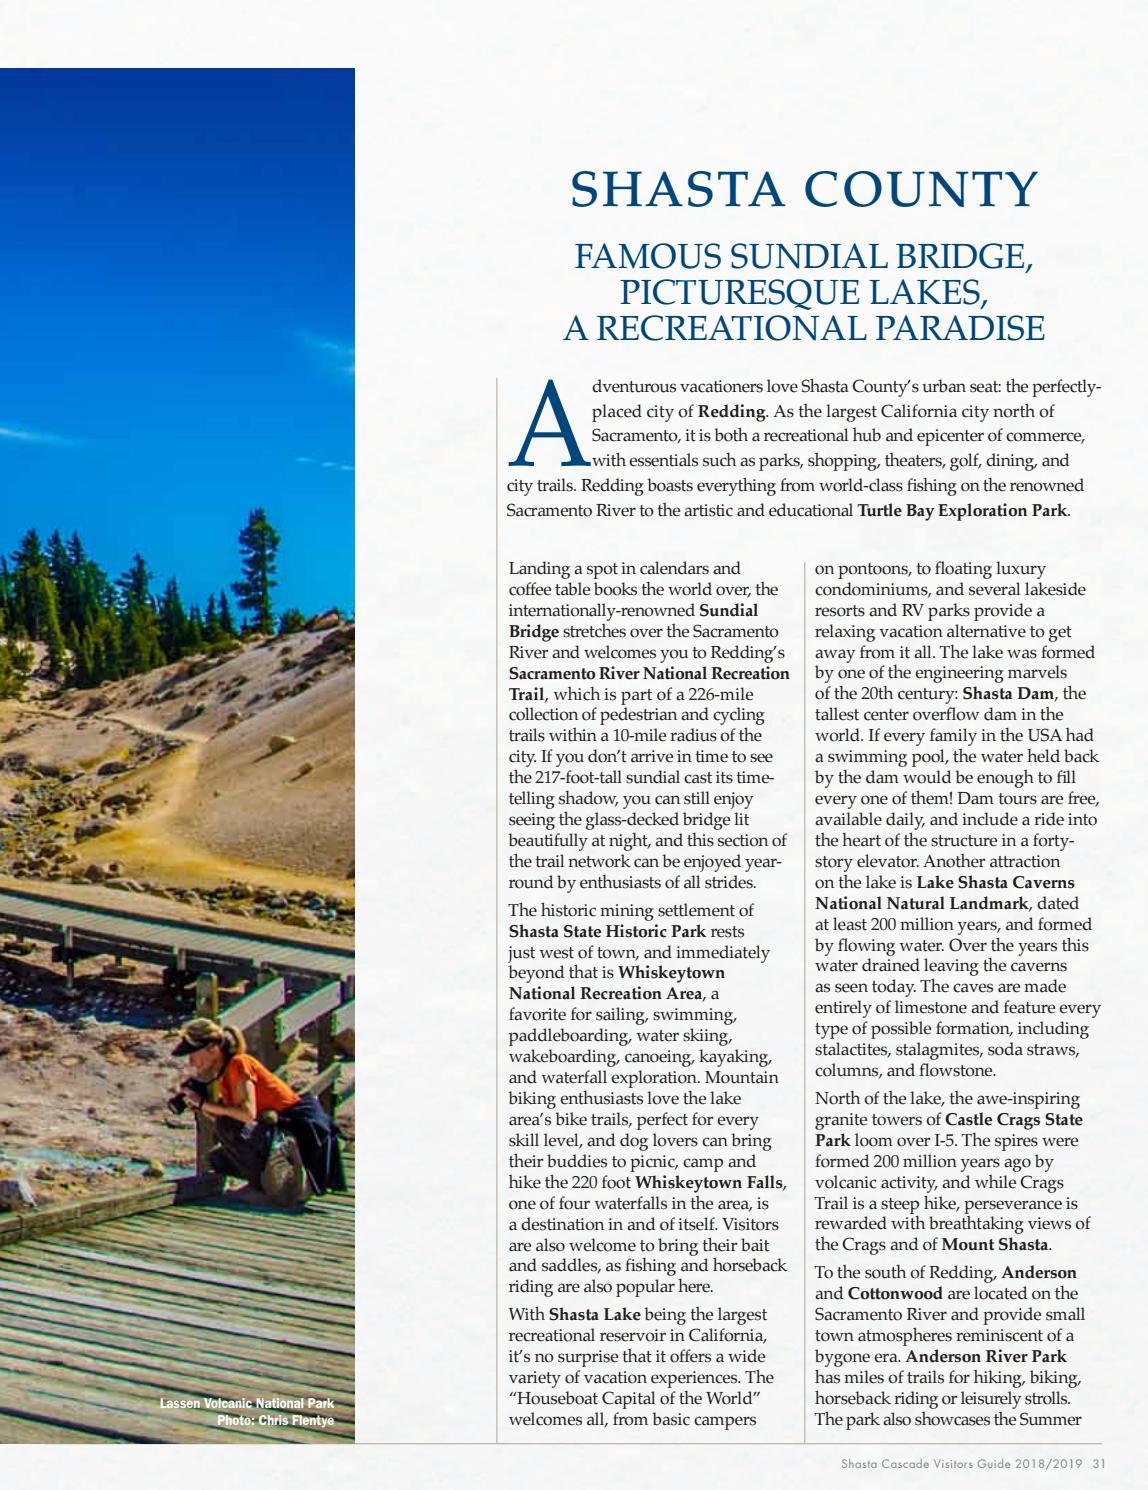 2018 Shasta Cascade Visitors Guide by Shasta Cascade